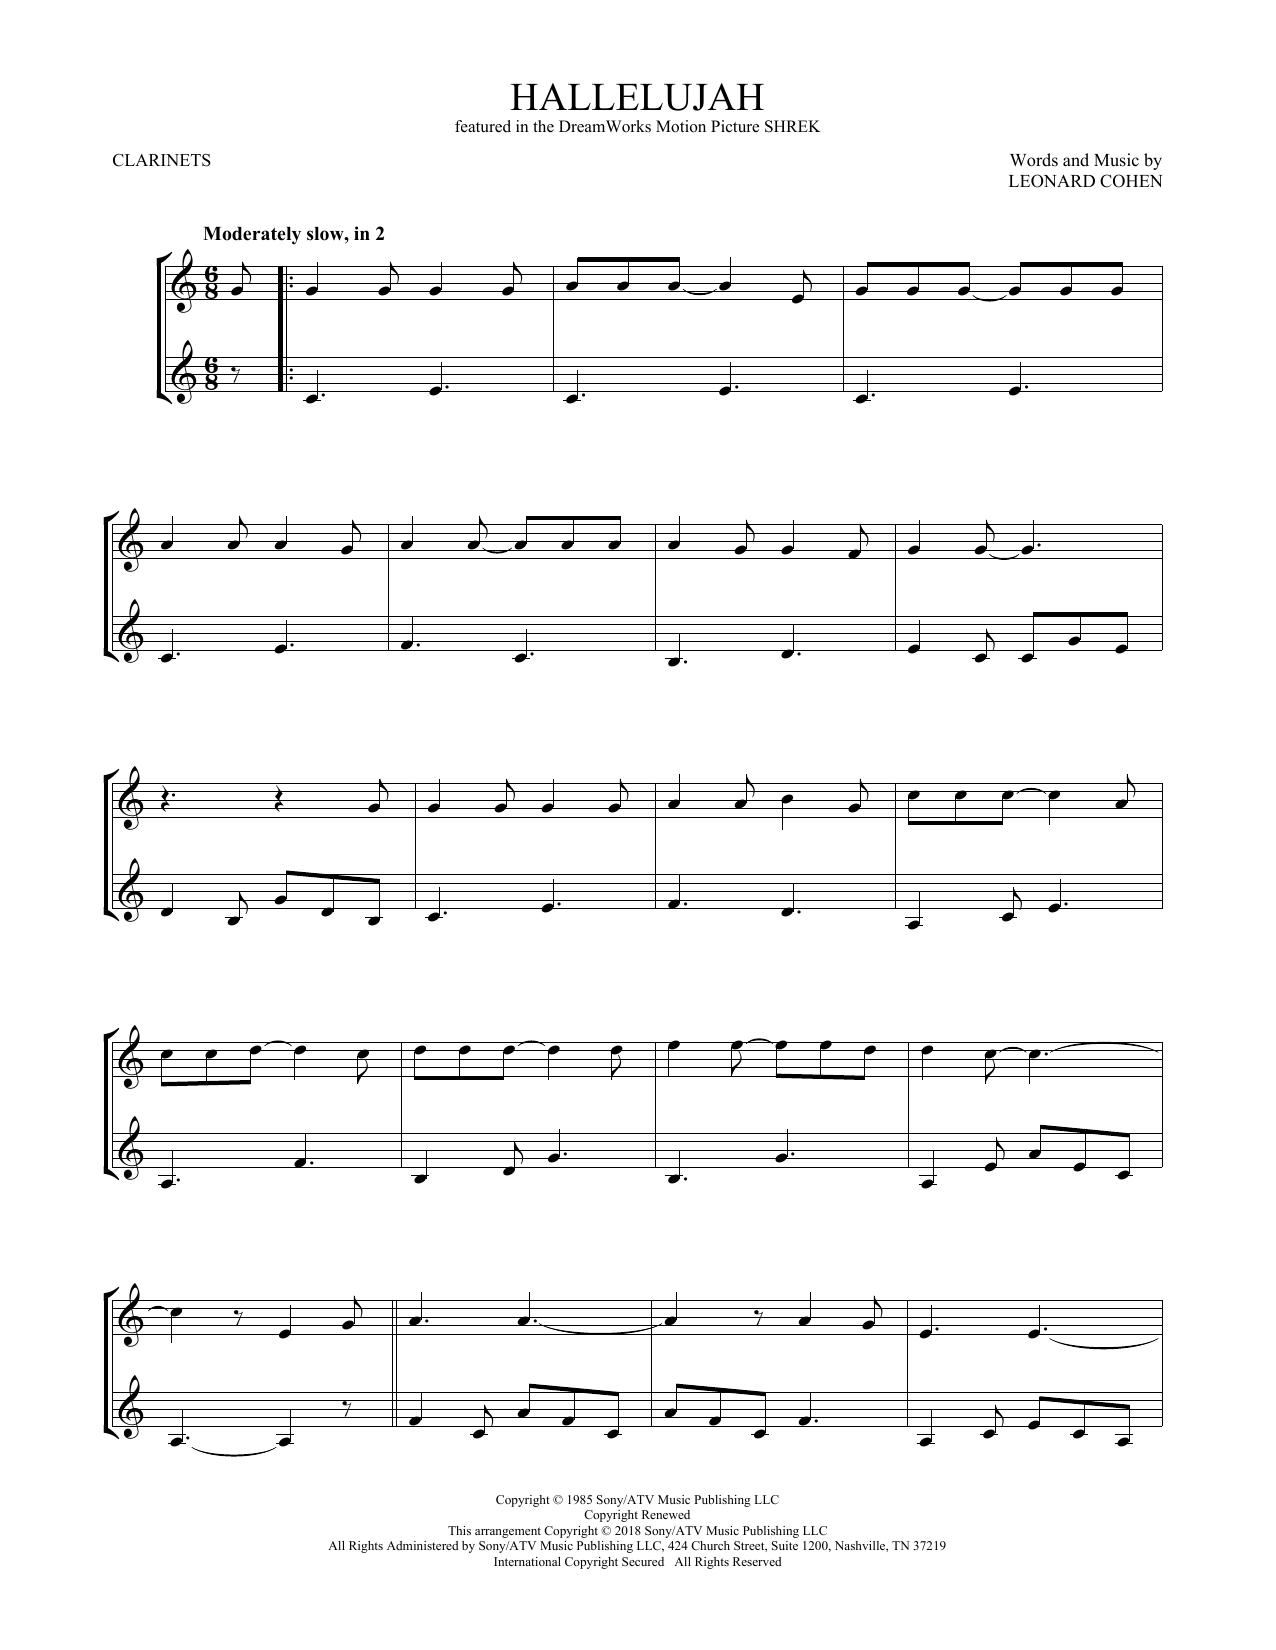 Hallelujah (Clarinet Duet)